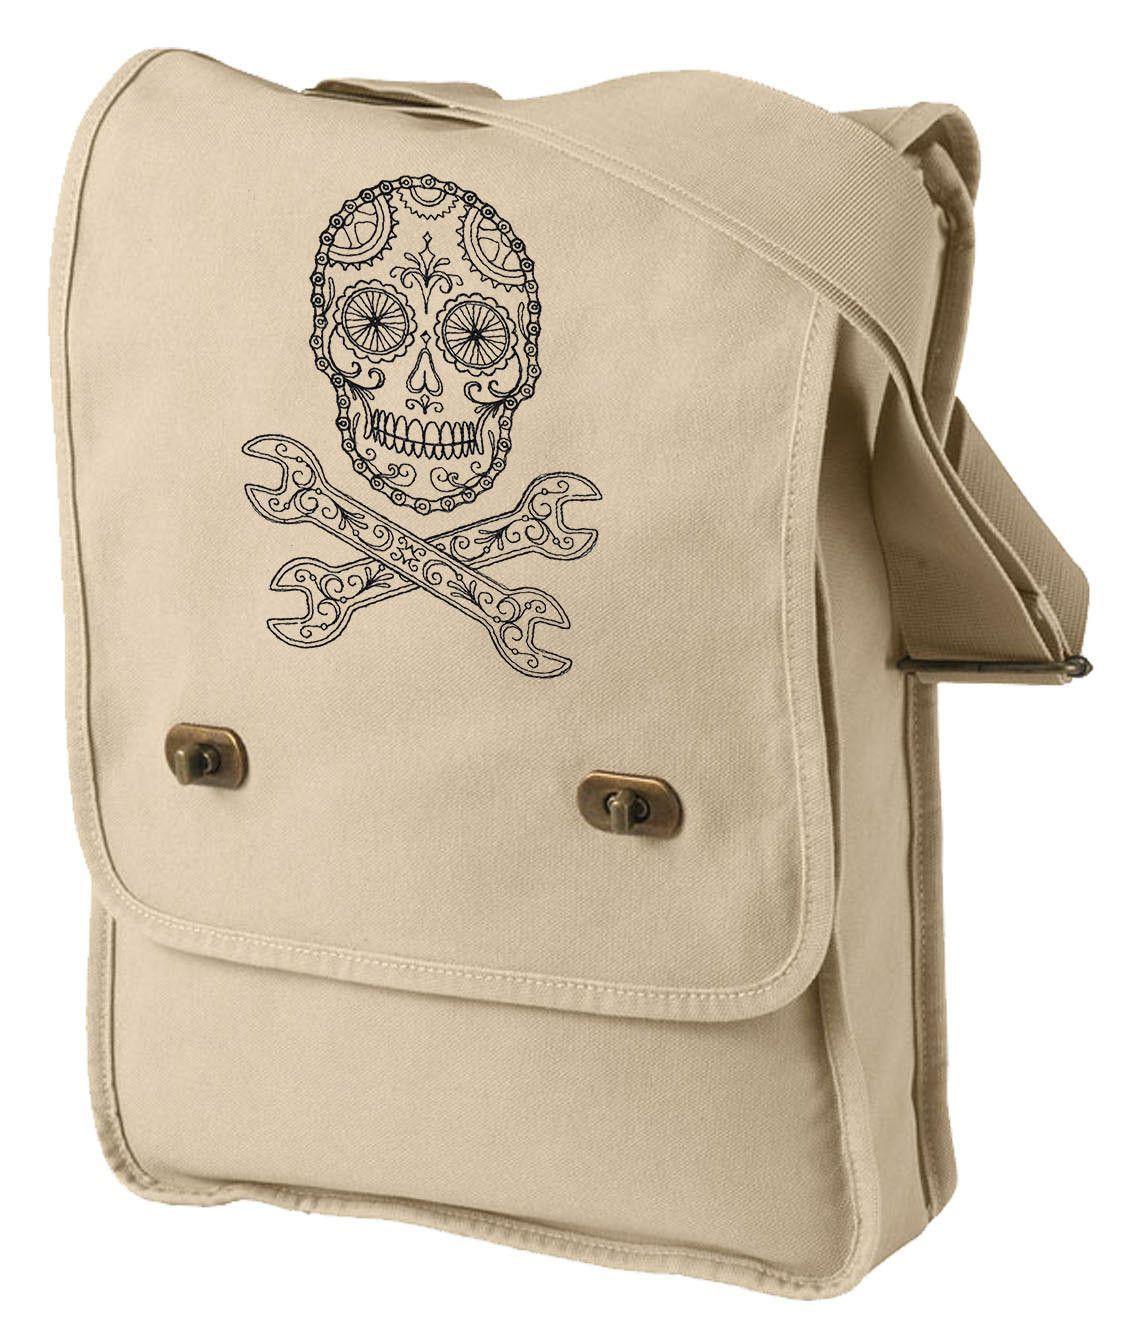 Bike Skull Embroidered Canvas Field Bag